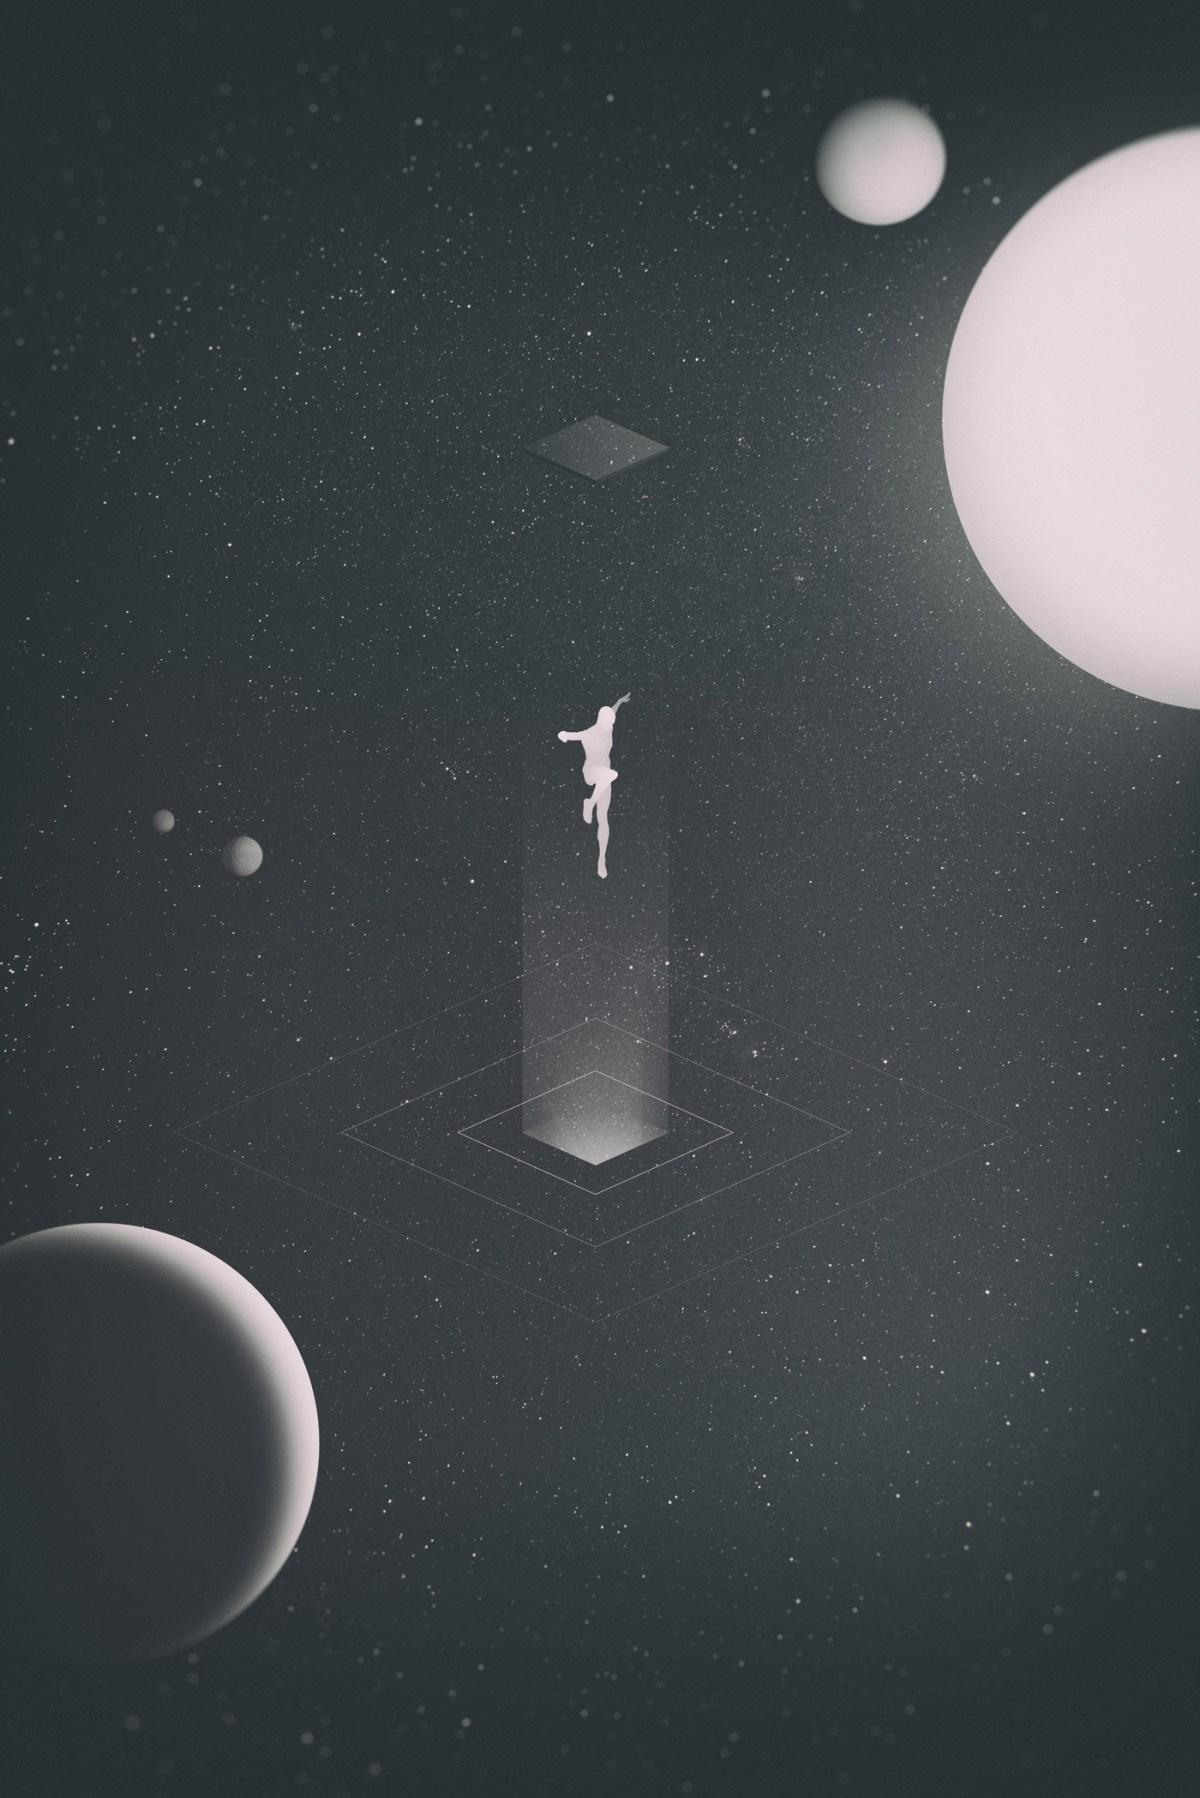 illustration-anxo-vizcaino-06